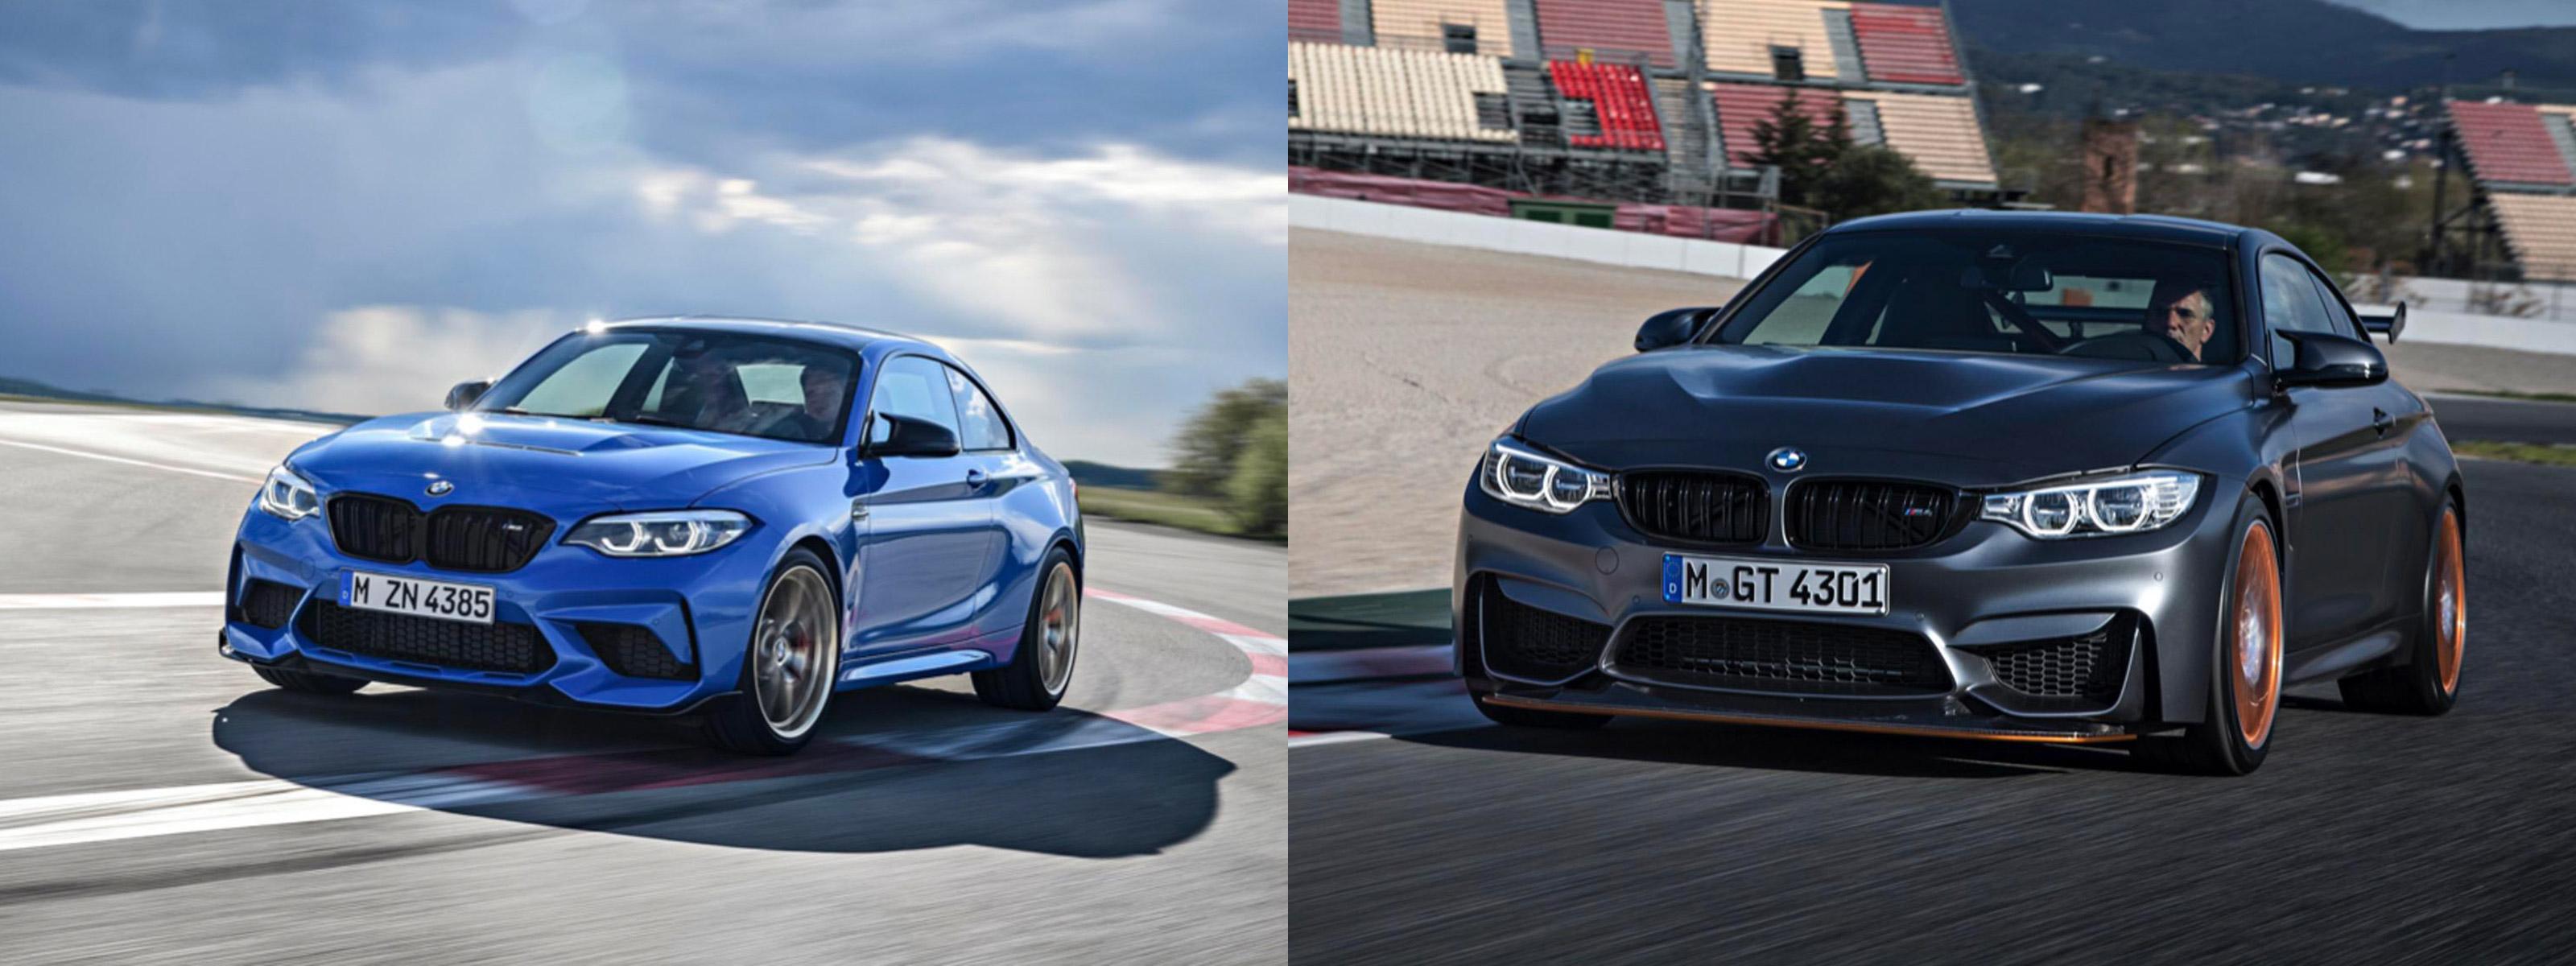 BMW M4 GTS BMW M2 CS